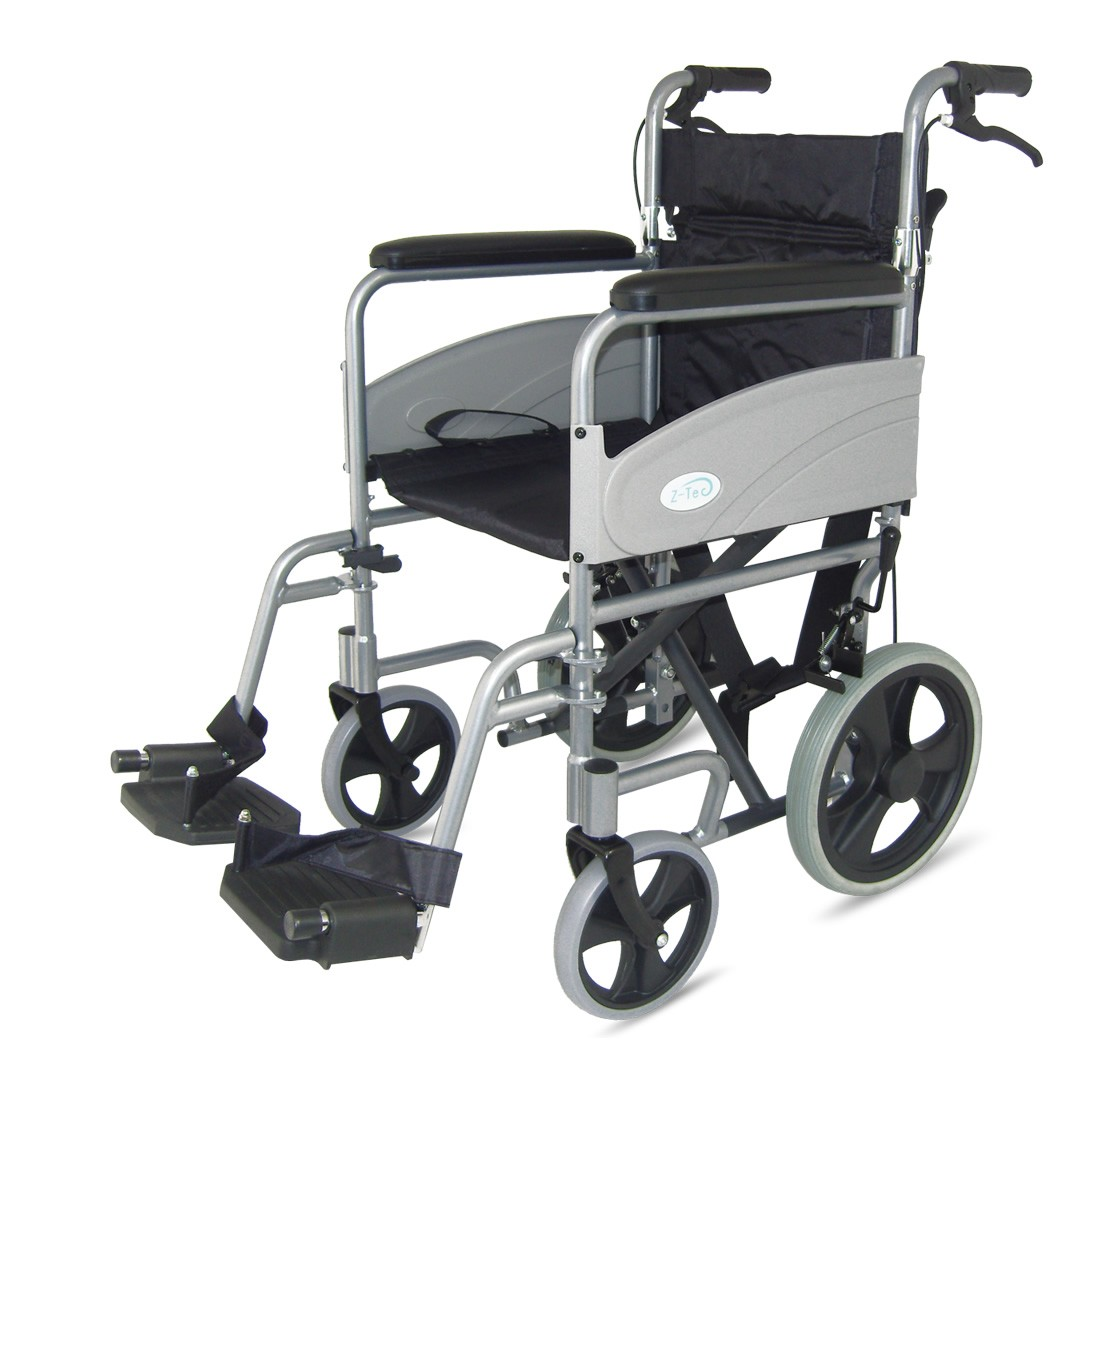 Folding Transit Wheelchair with attendant brake from z-tec